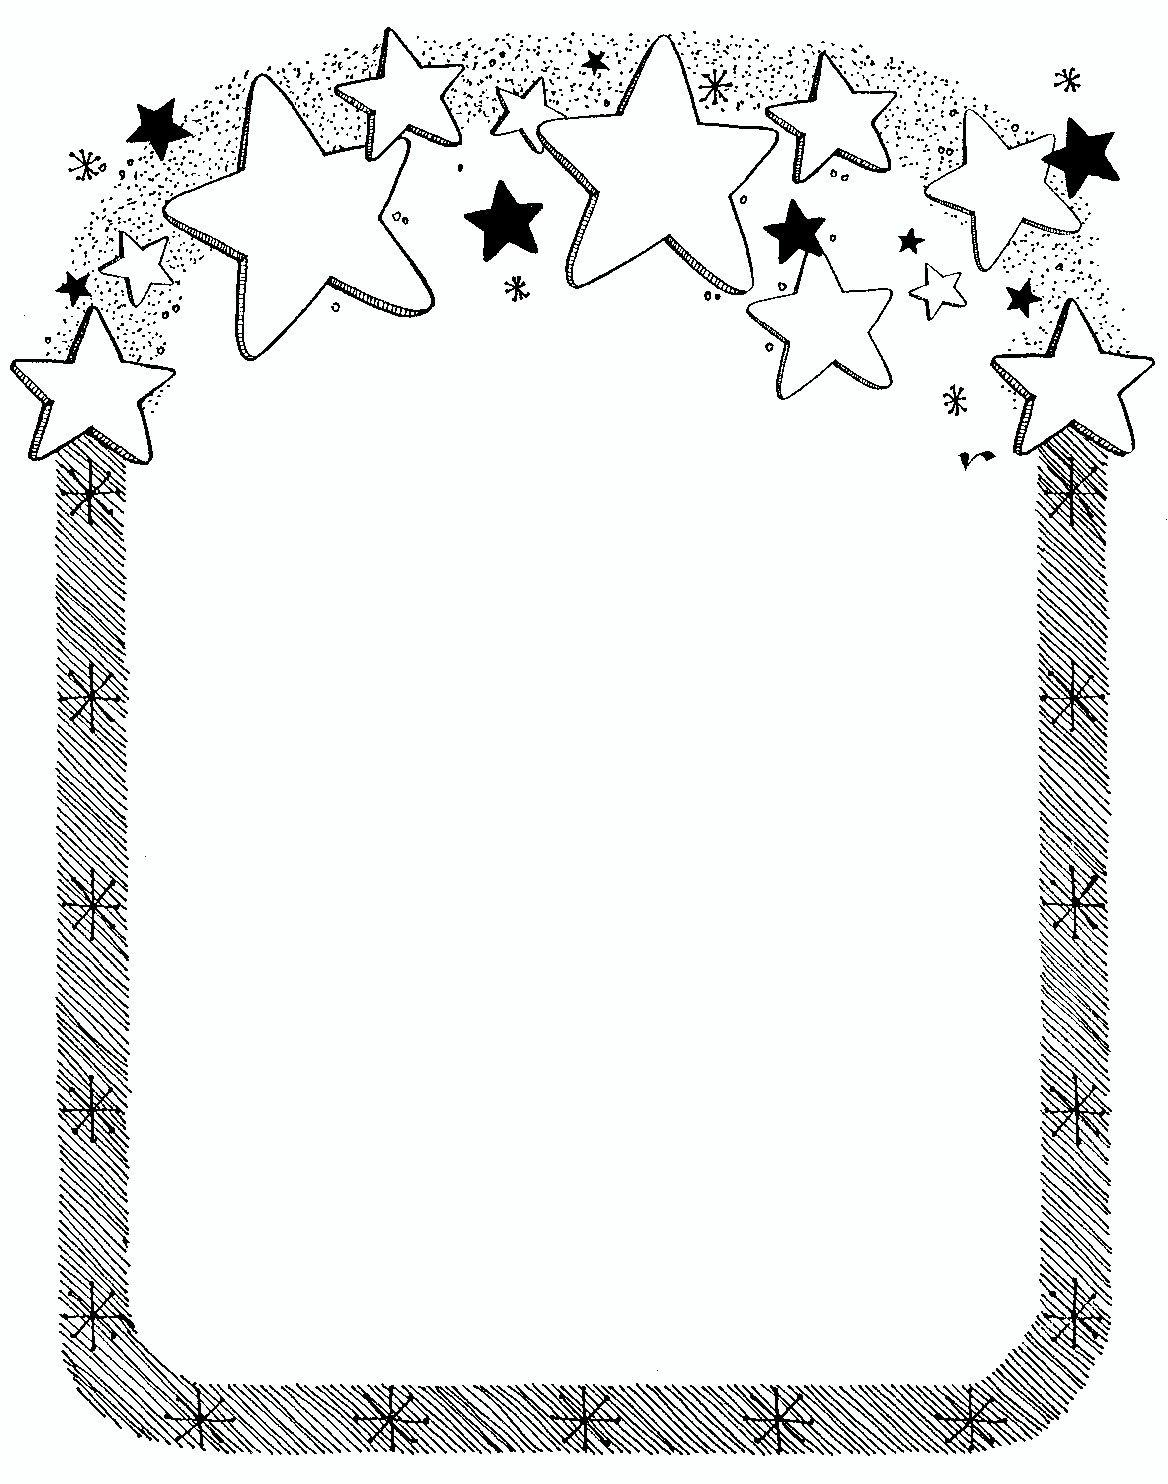 Pin By Naz Kaya On Siyah Beyaz Cerceveler Clip Art Borders Clip Art Page Borders Design